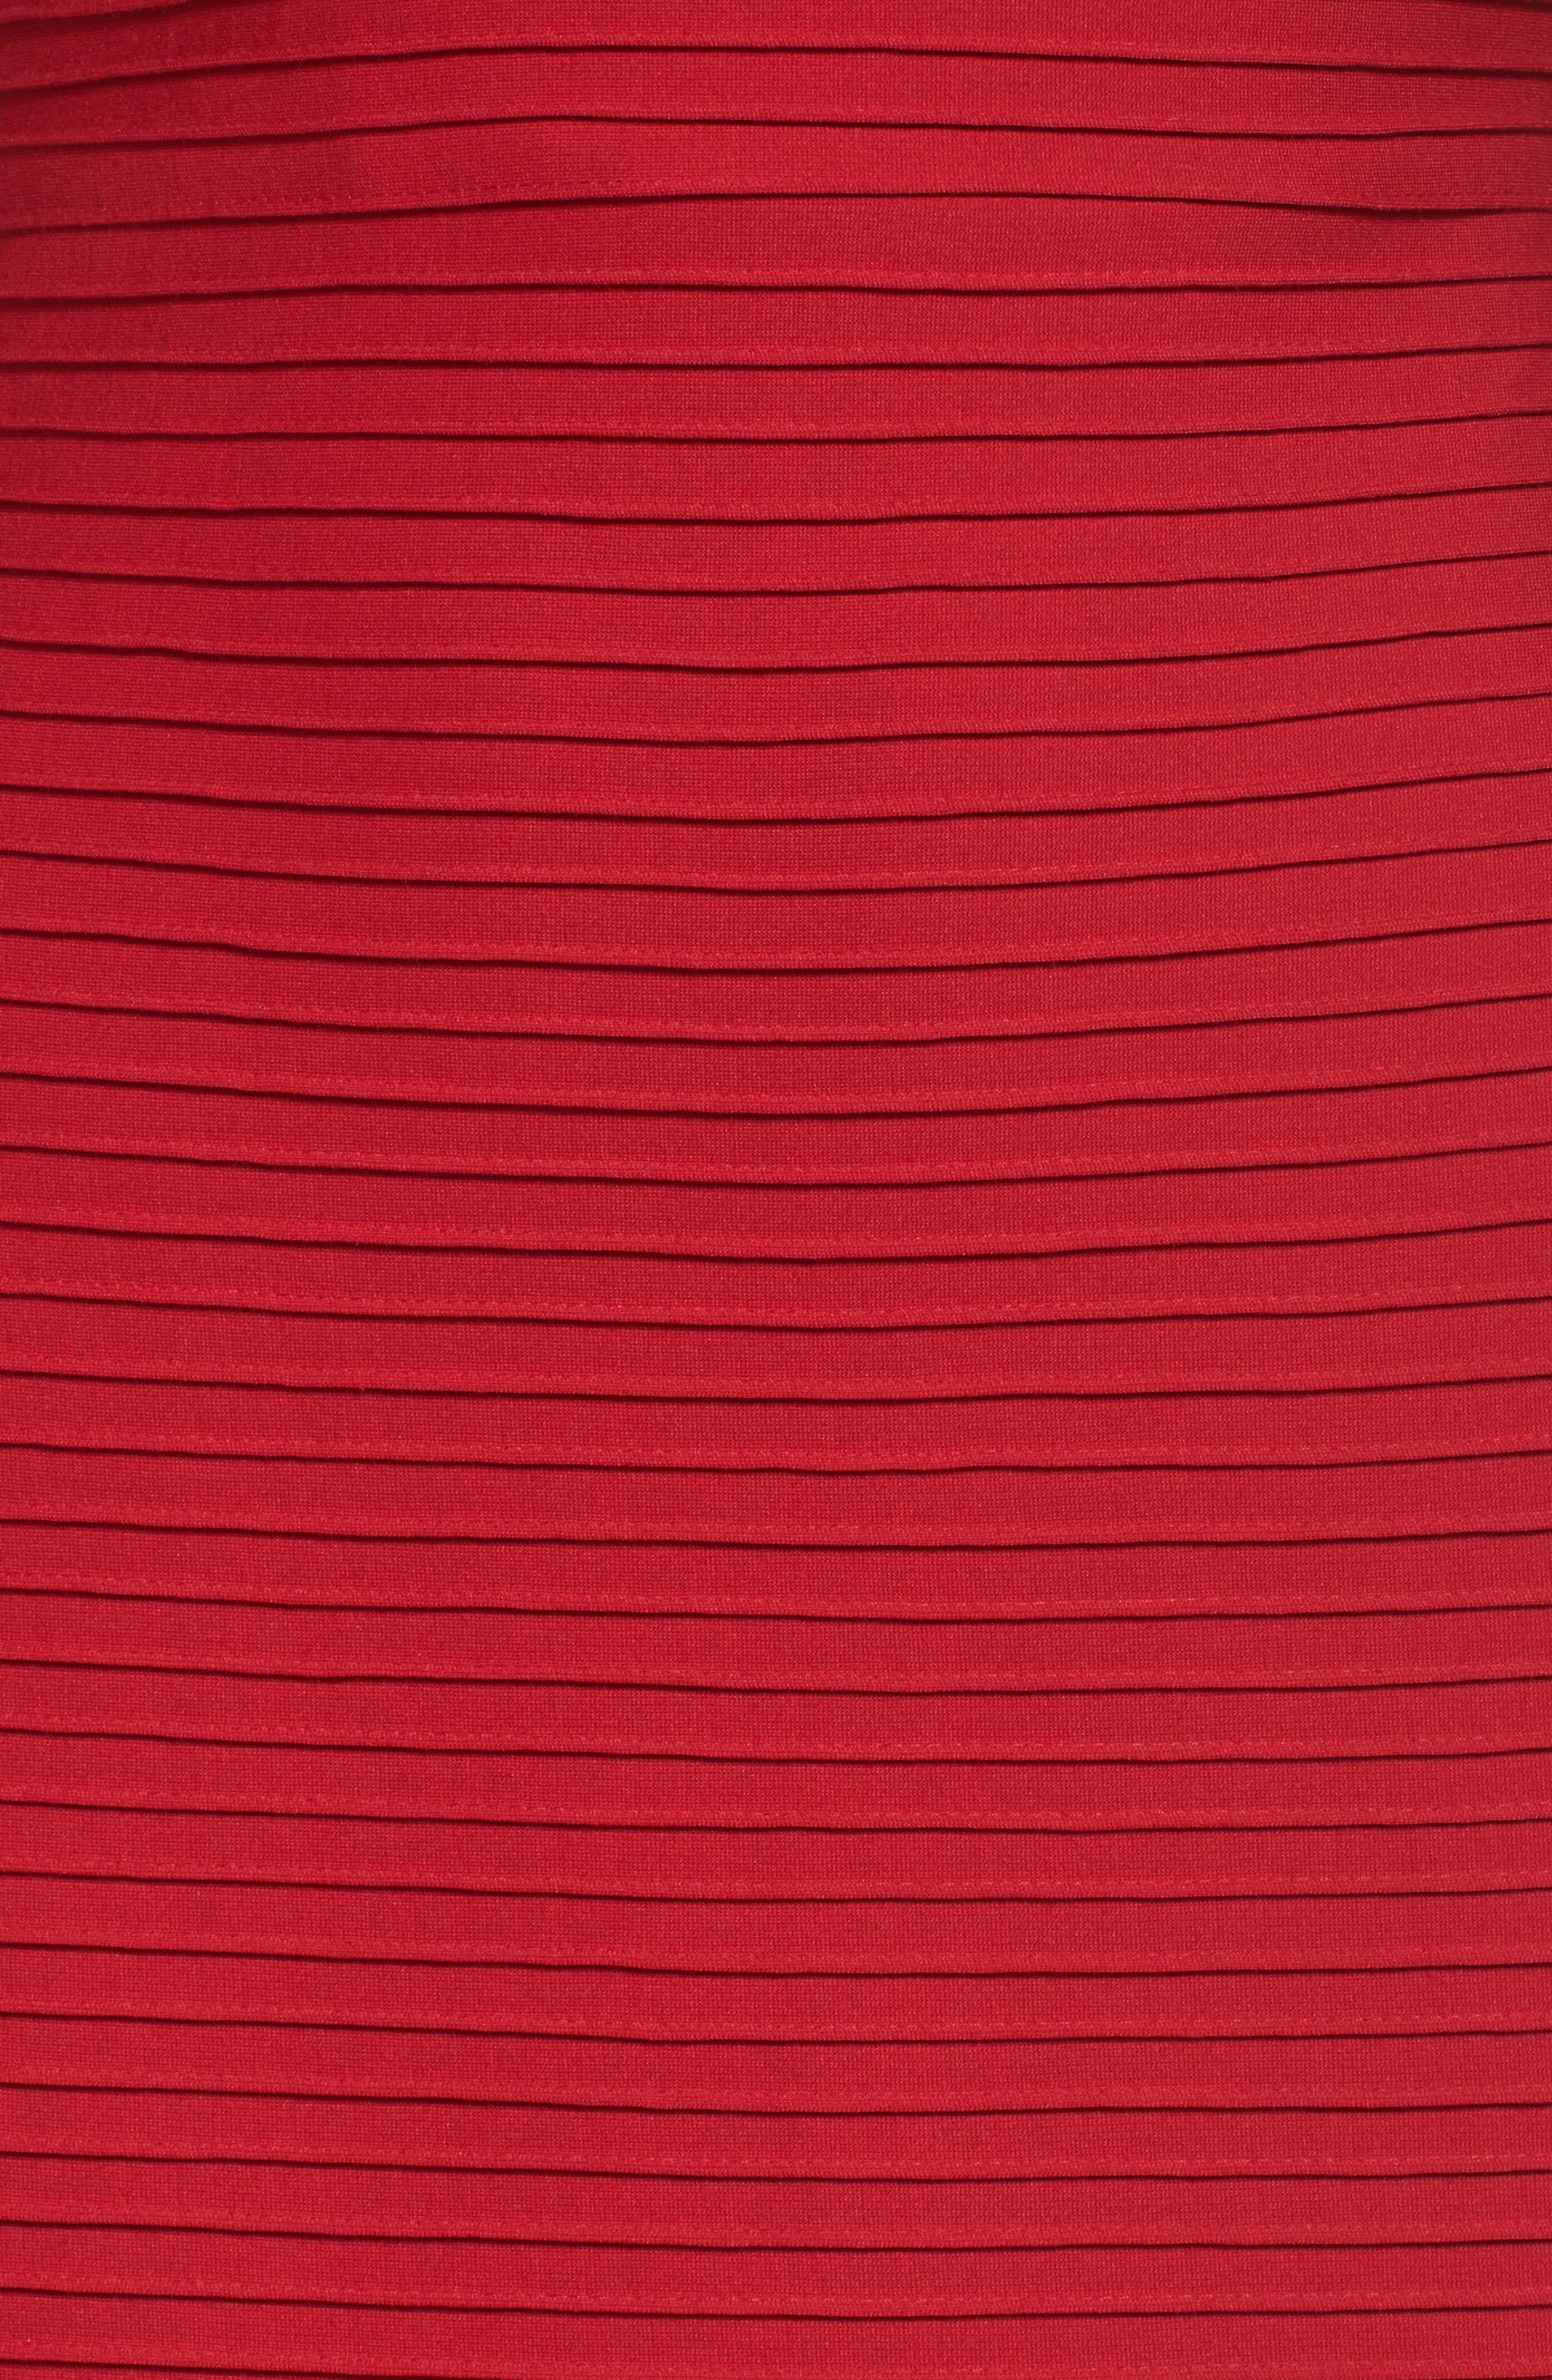 Illusion Pintuck Sheath Dress,                             Alternate thumbnail 5, color,                             Deep Red